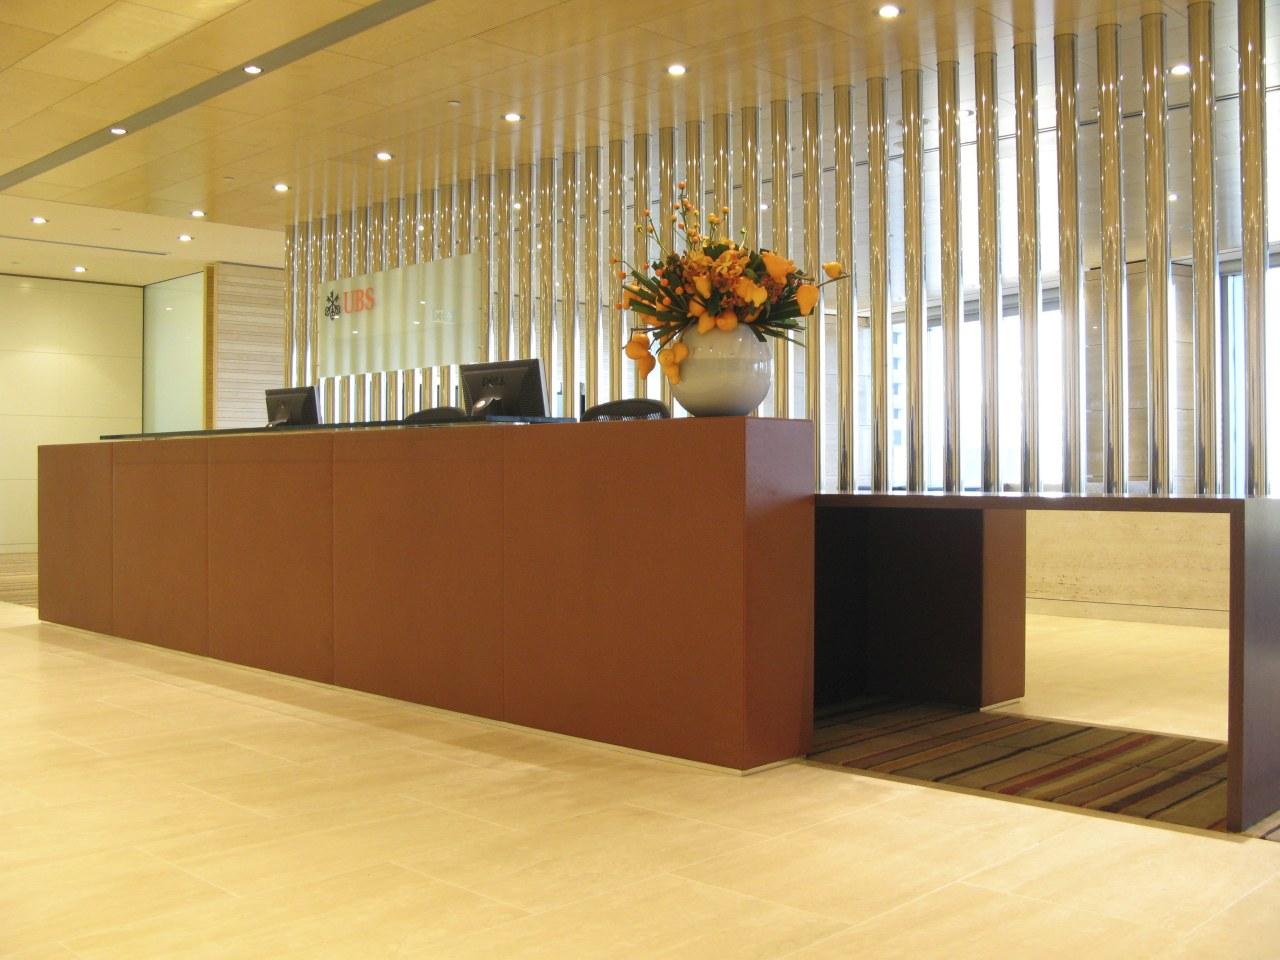 The leather and wenge veneer reception desk reflects floor, flooring, furniture, hardwood, interior design, lobby, wall, orange, brown